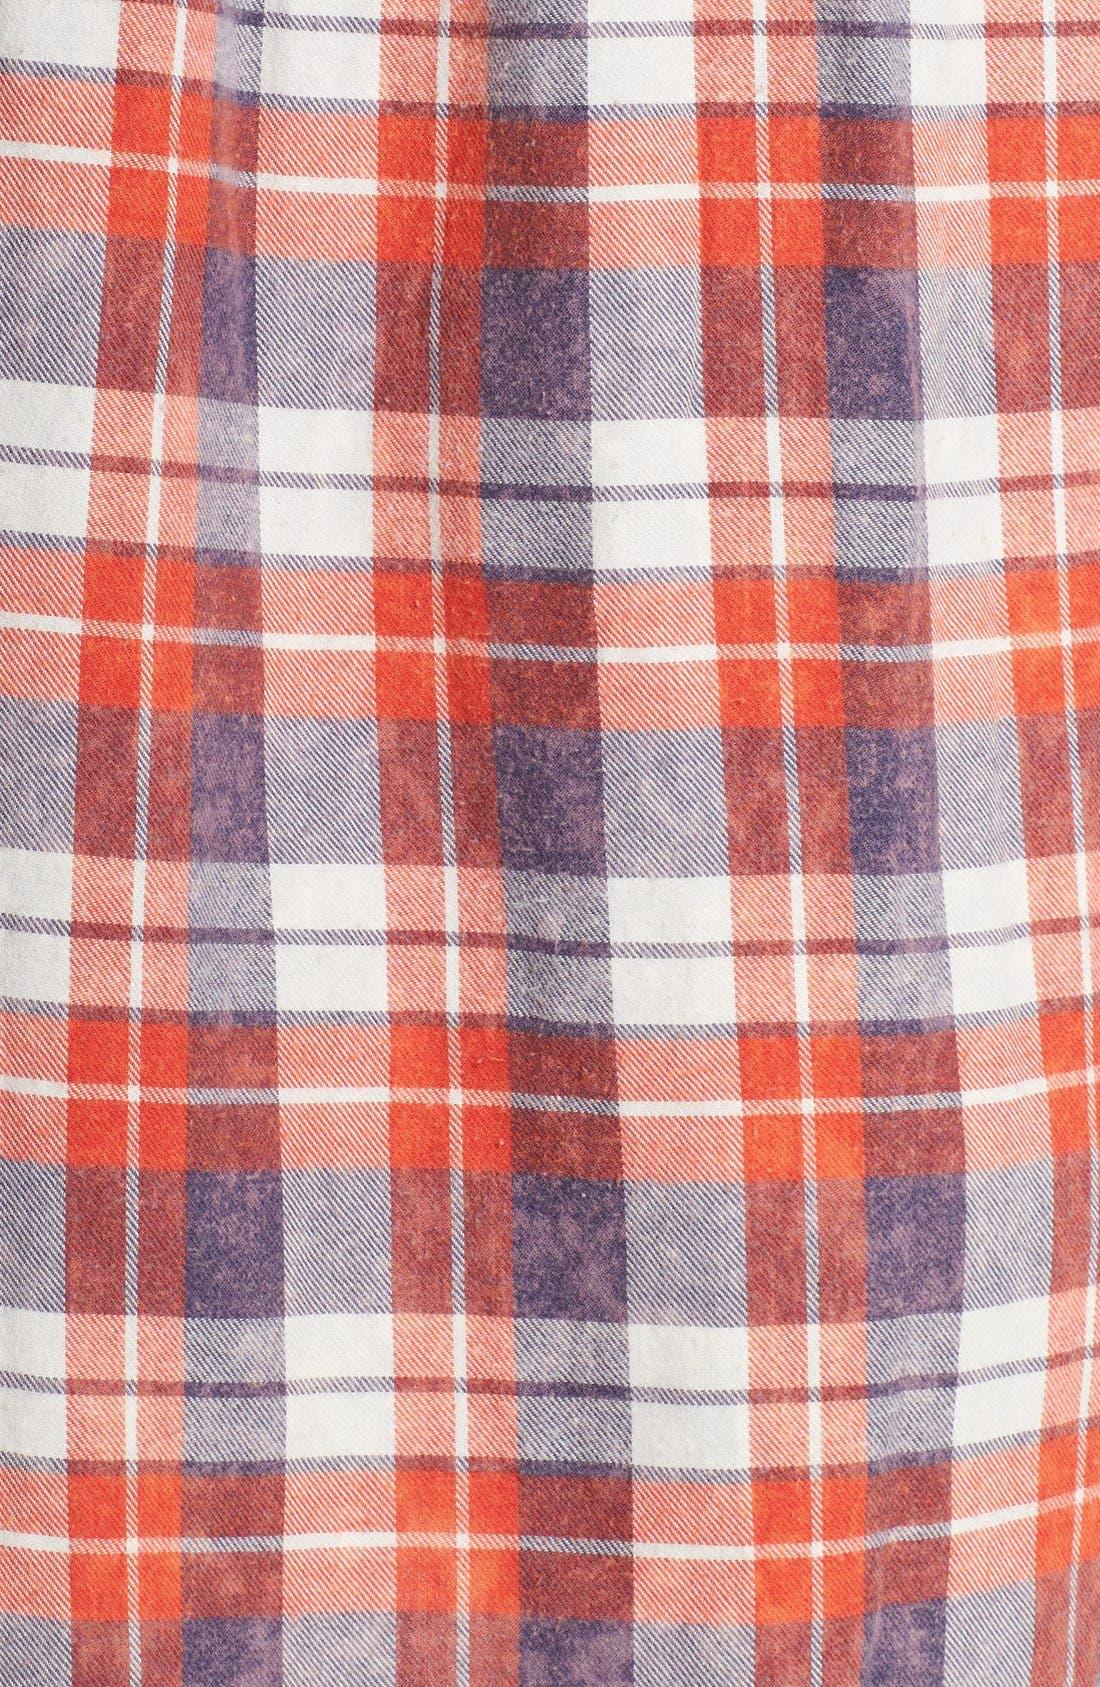 Plaid Cotton Blend Nightshirt,                             Alternate thumbnail 38, color,